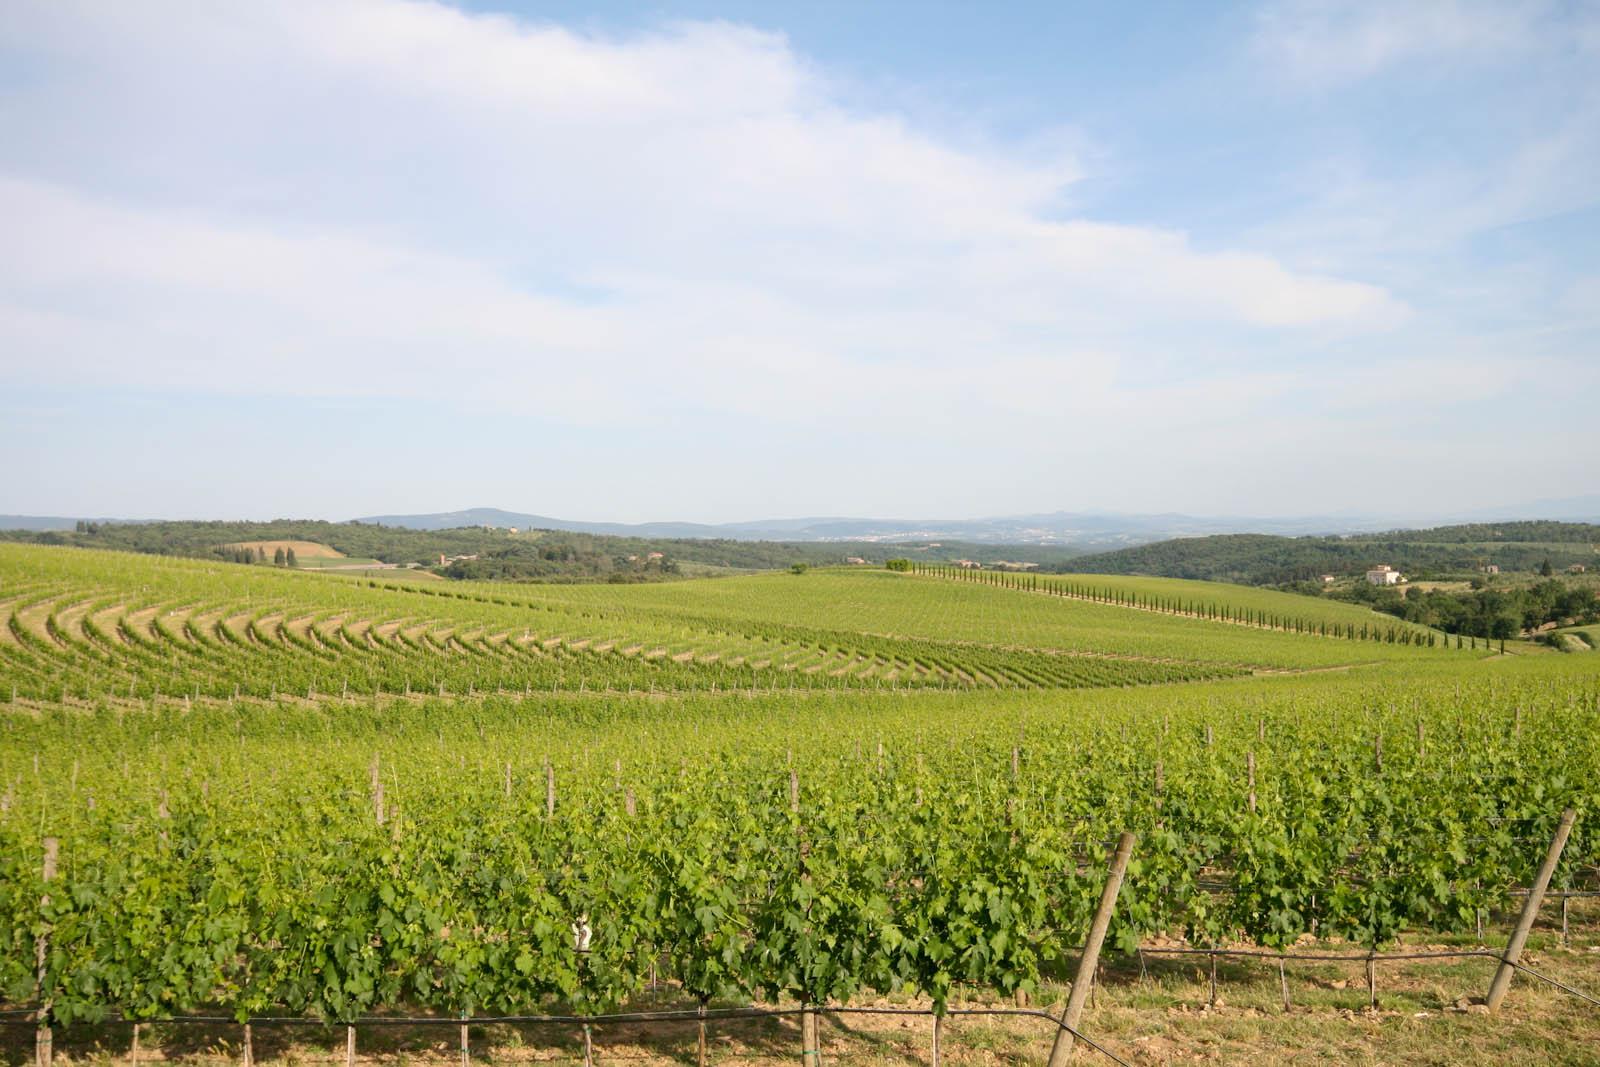 Winery DOCG Chianti Colli Pisani